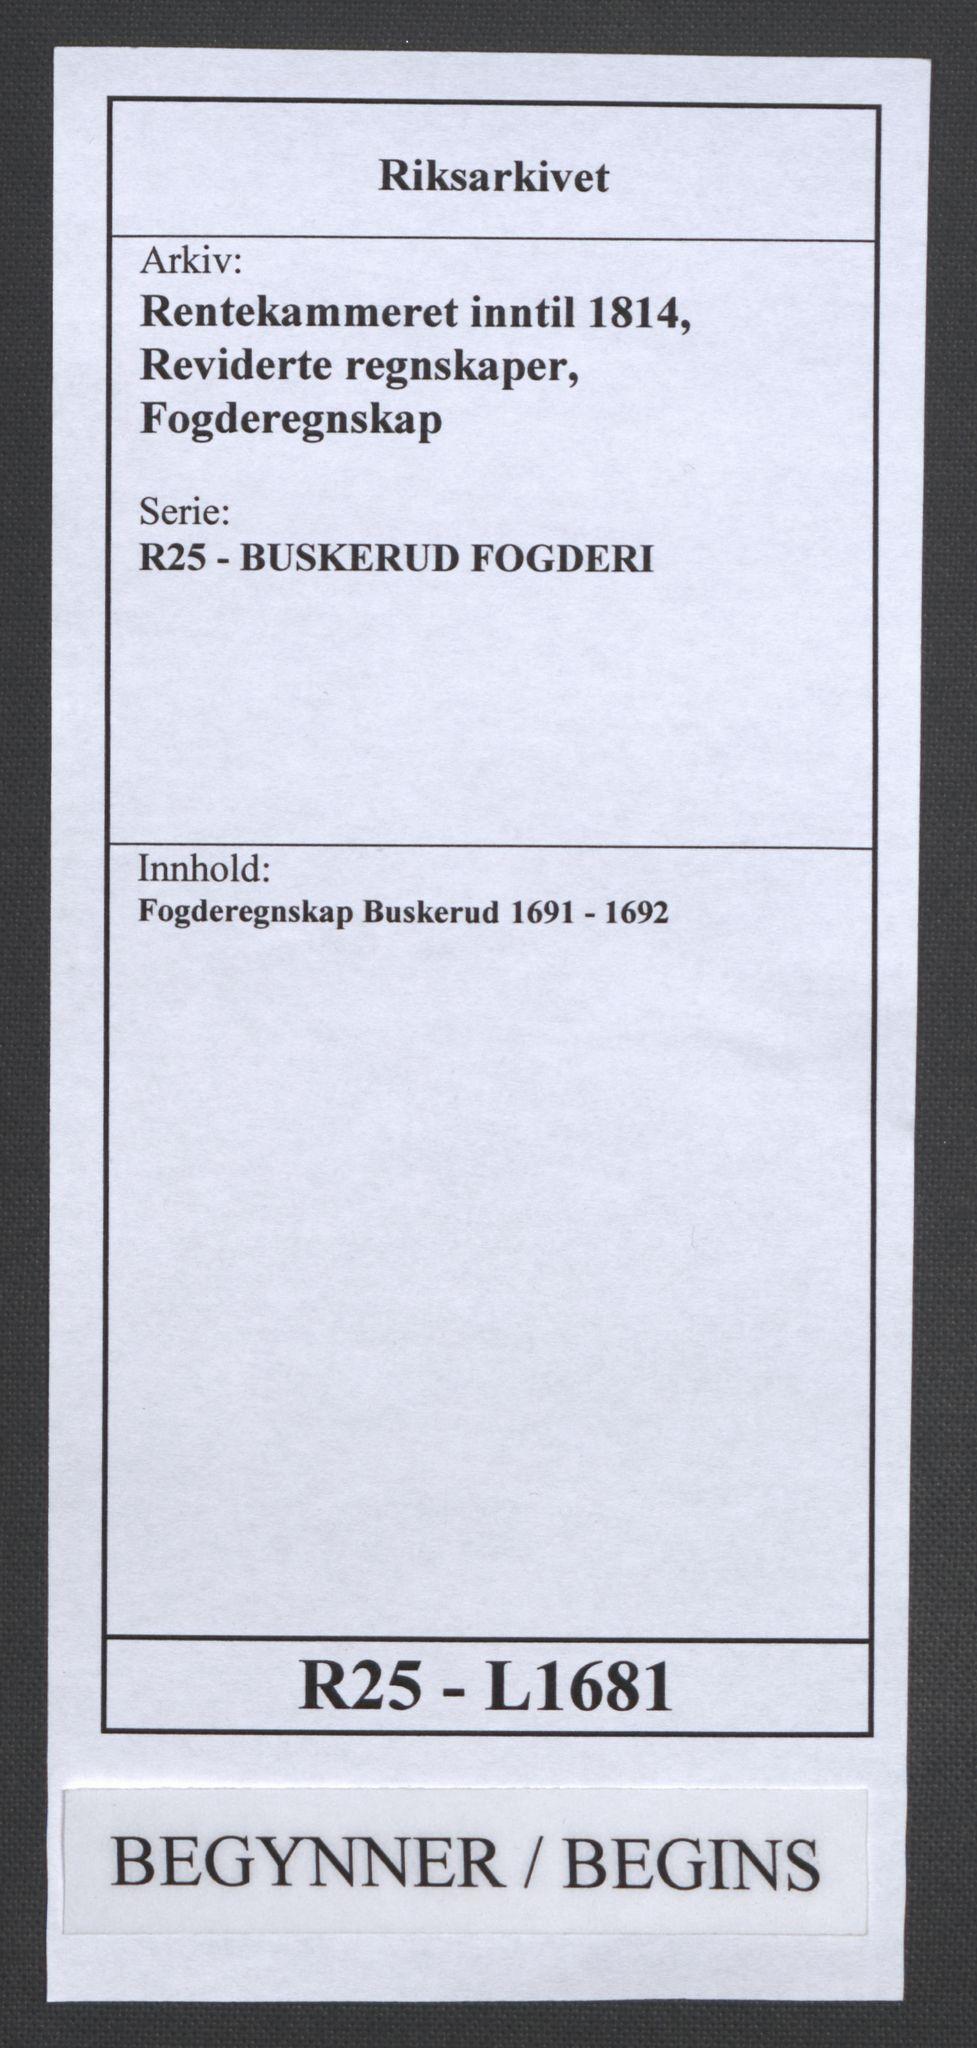 RA, Rentekammeret inntil 1814, Reviderte regnskaper, Fogderegnskap, R25/L1681: Fogderegnskap Buskerud, 1691-1692, s. 1